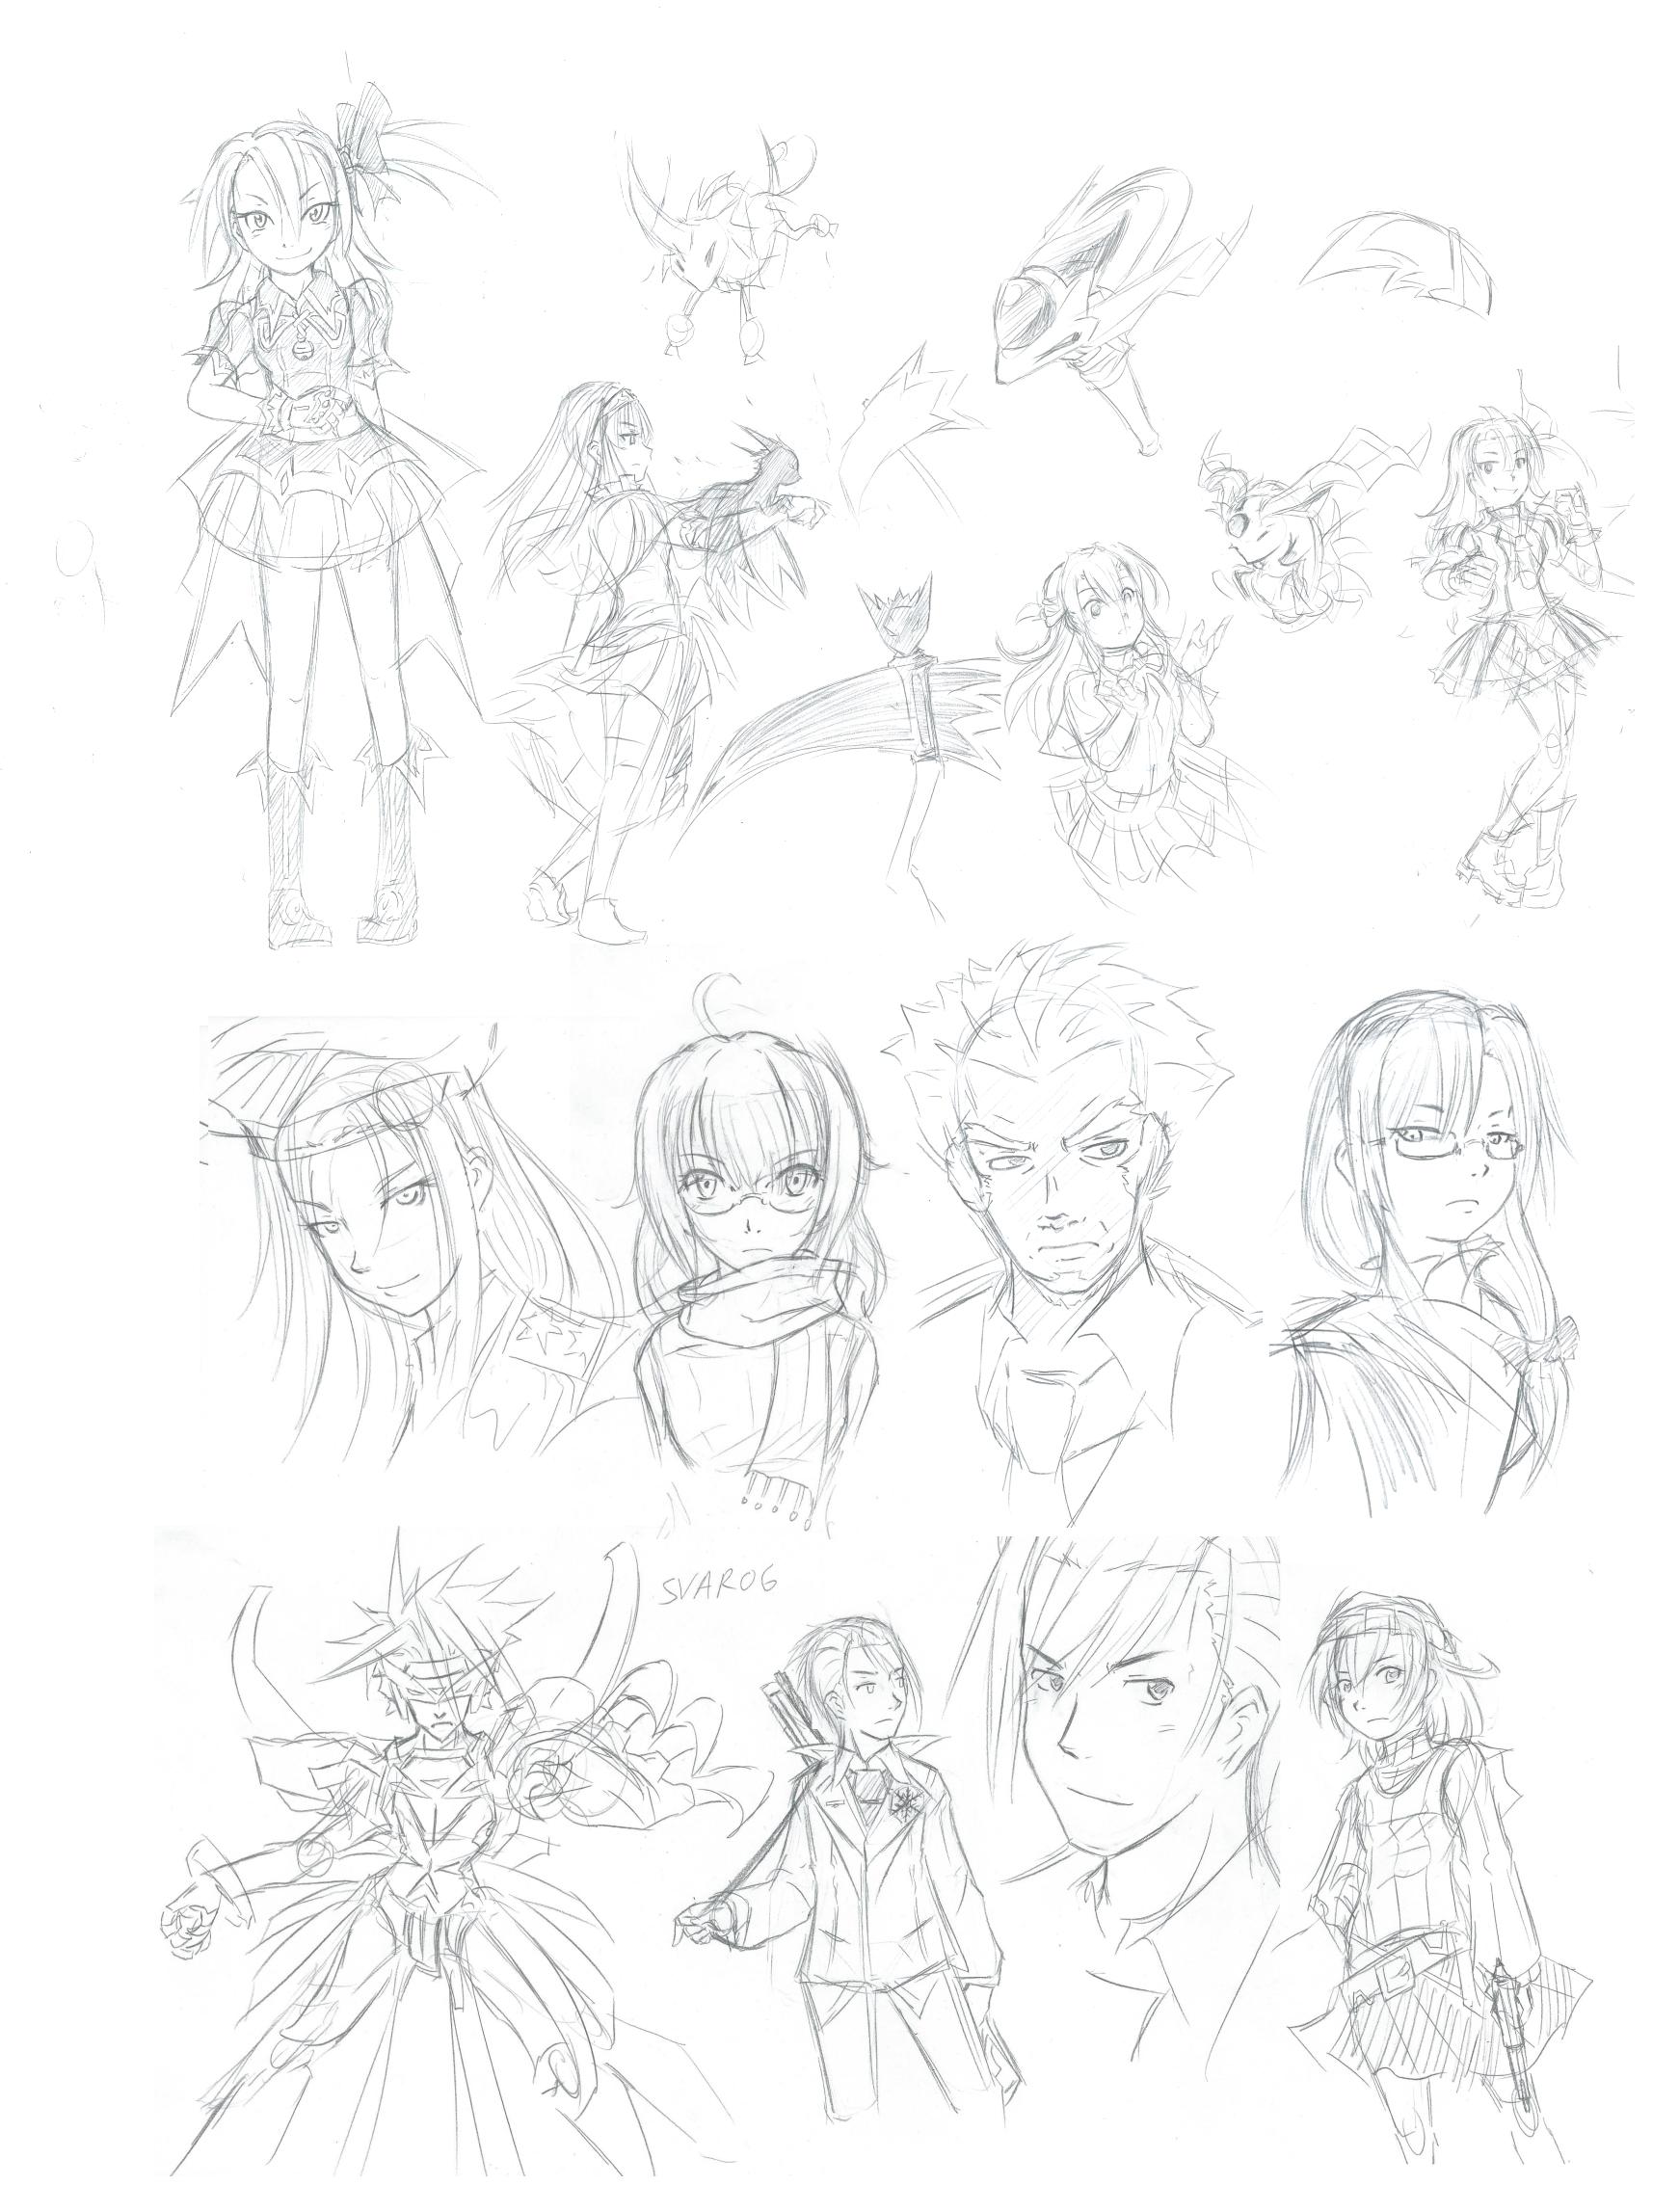 2013 Sketchdump 1 by L-Rossfellow